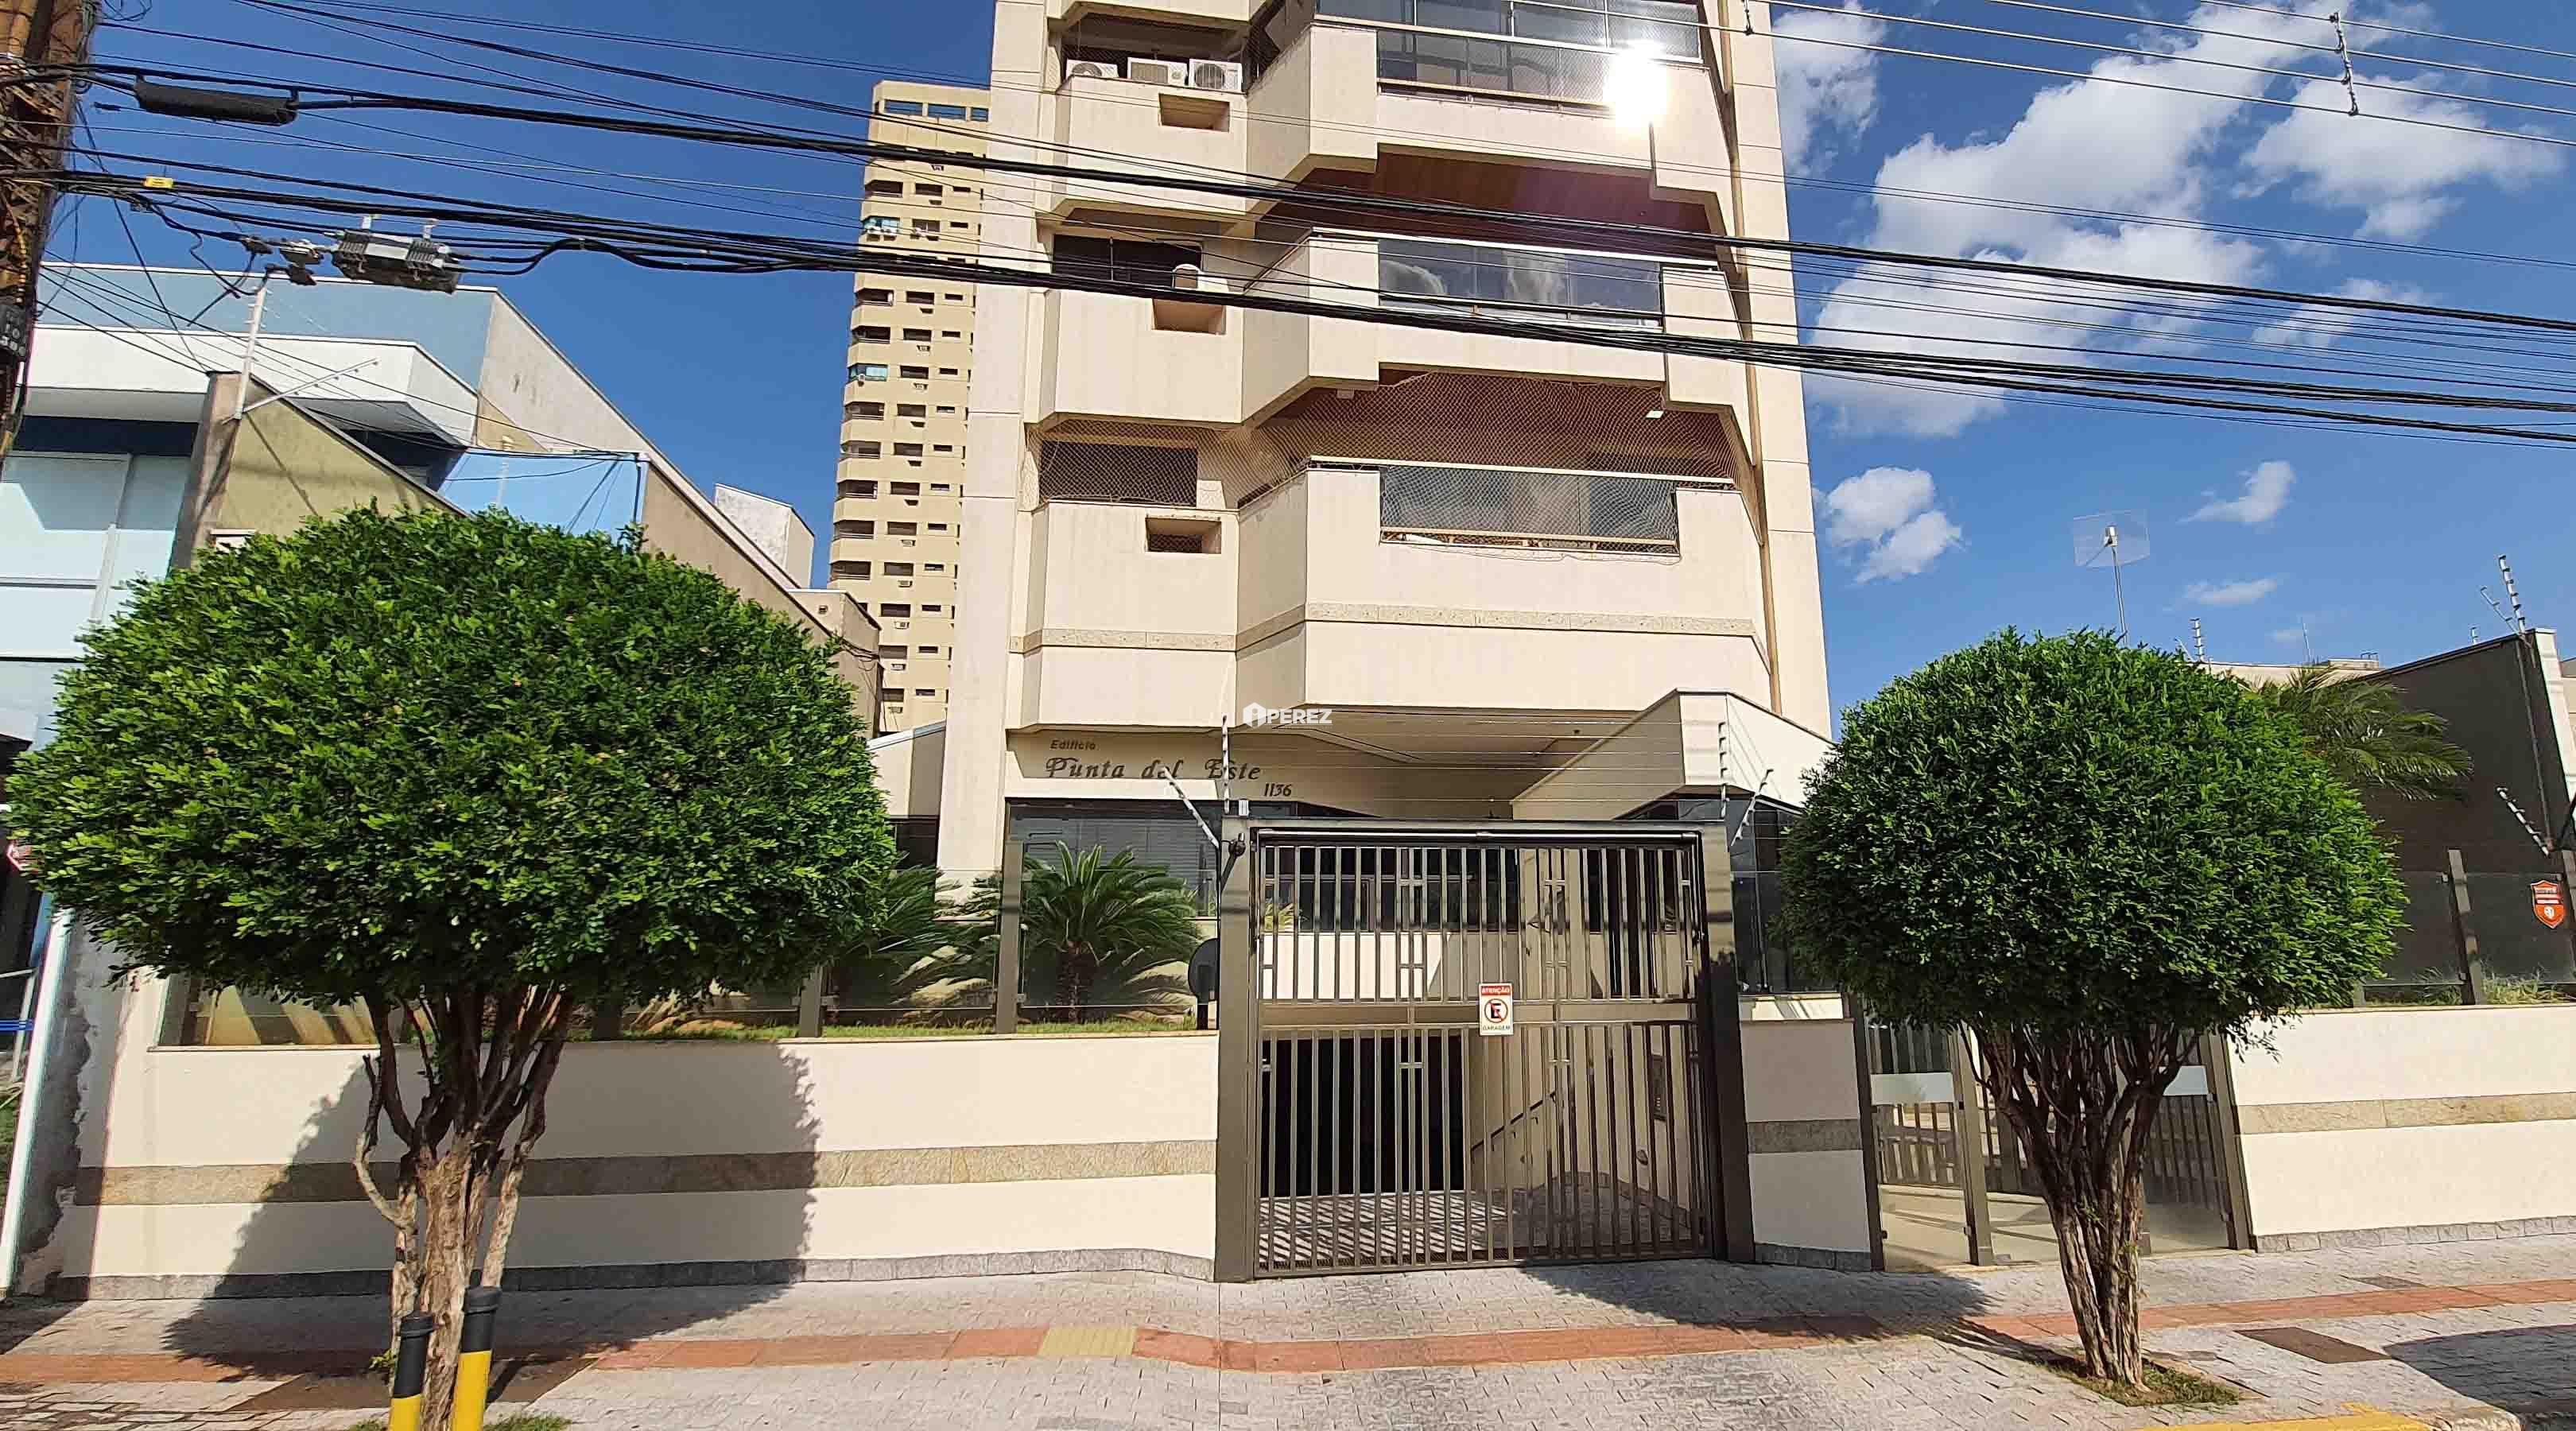 venda-campo-grande-ms-apartamento-maracaju-centro-perez-imoveis